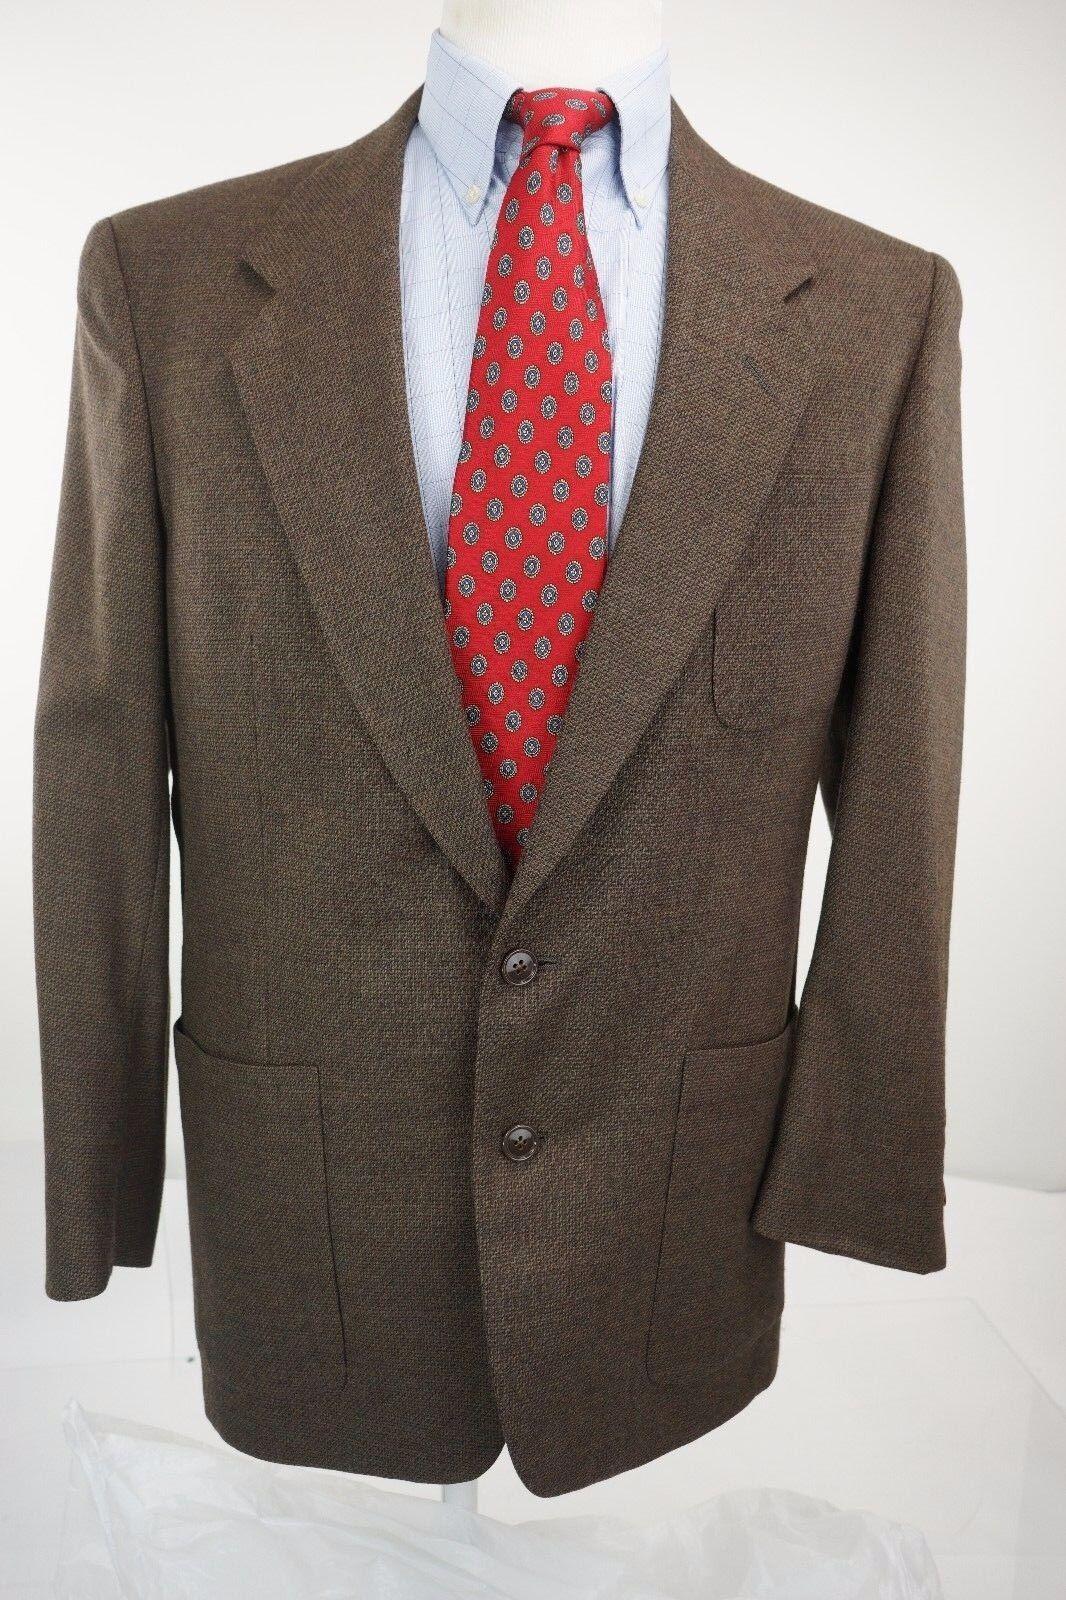 Christian Dior Monsieur Braun Nailhead Sport Coat Blazer Größe 41R 2 button